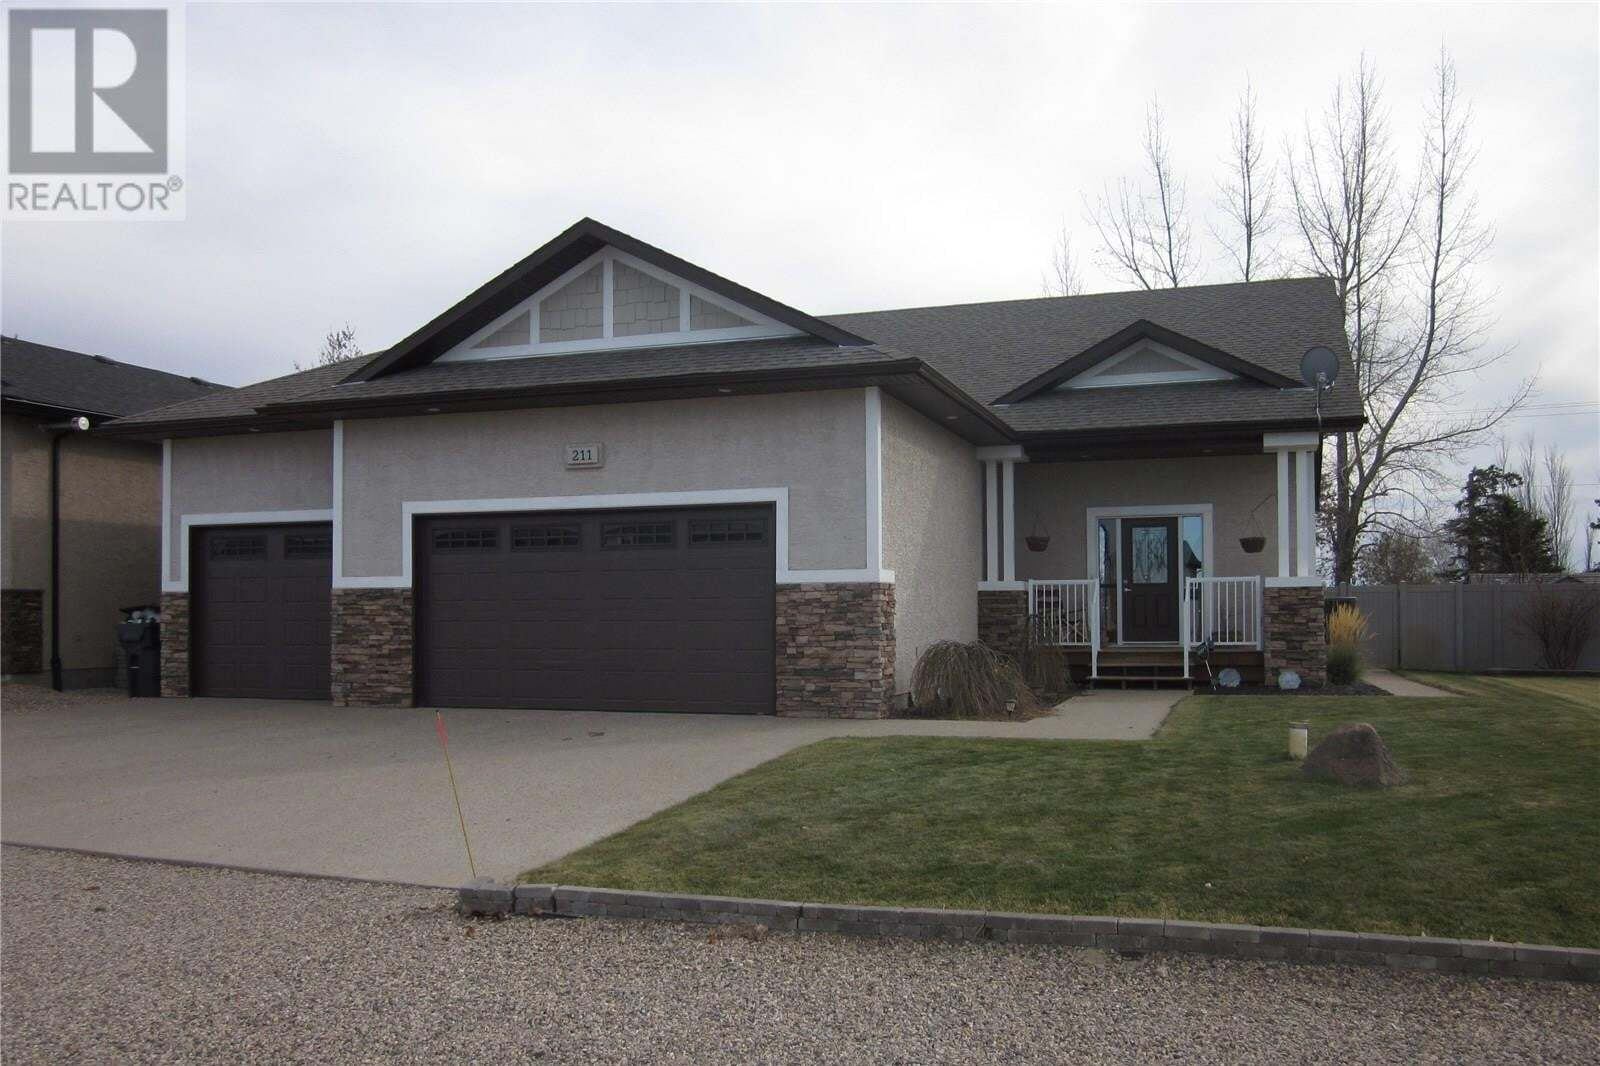 House for sale at 211 Willow Ridge Dr Pilot Butte Saskatchewan - MLS: SK810436